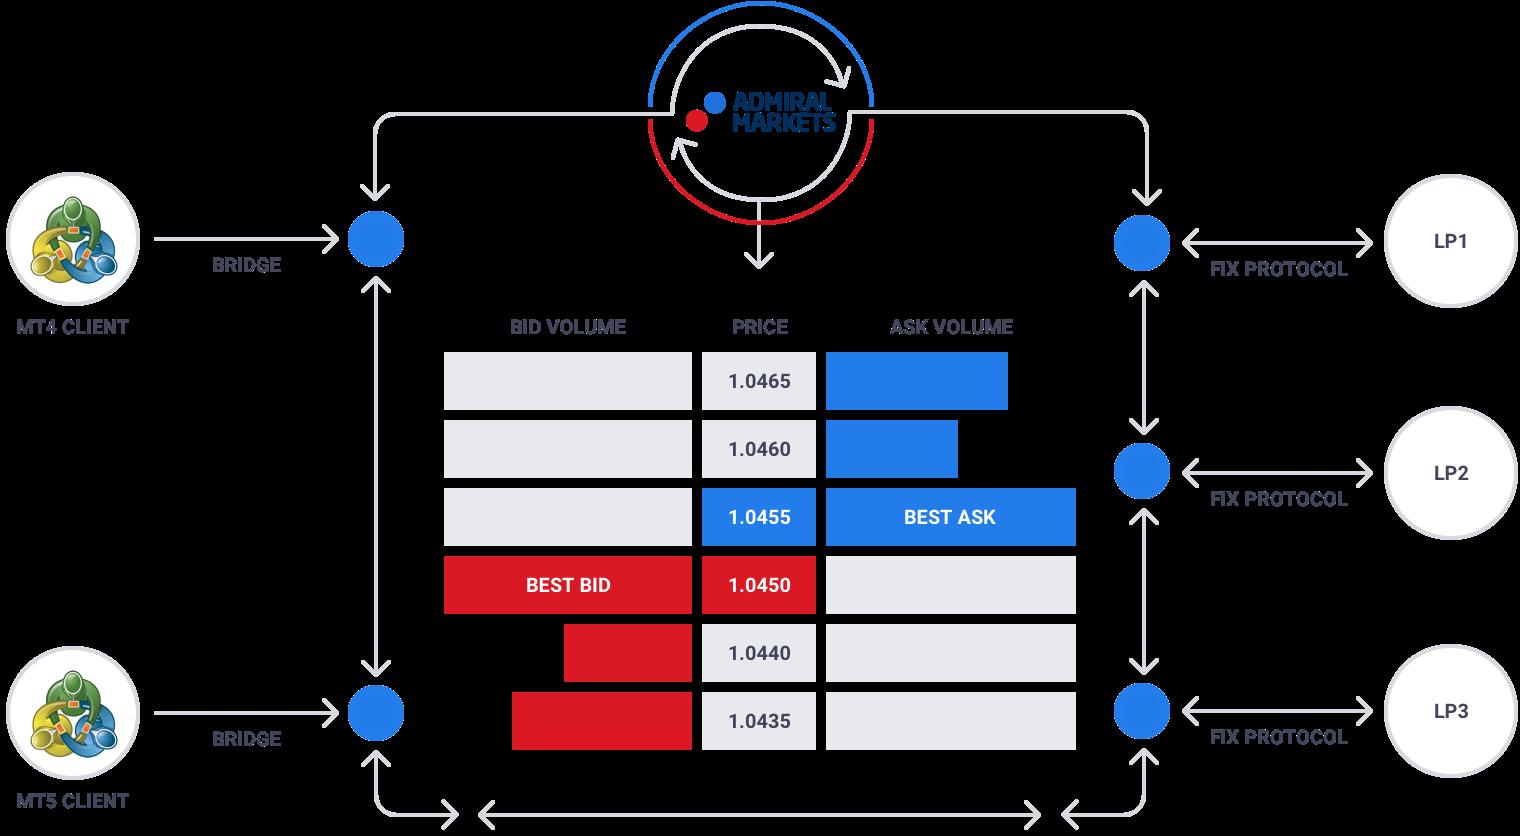 Schemat prezentuje jak platformy Admiral Markets MetaTrader 4 i MetaTrader 5 pracują z ECN